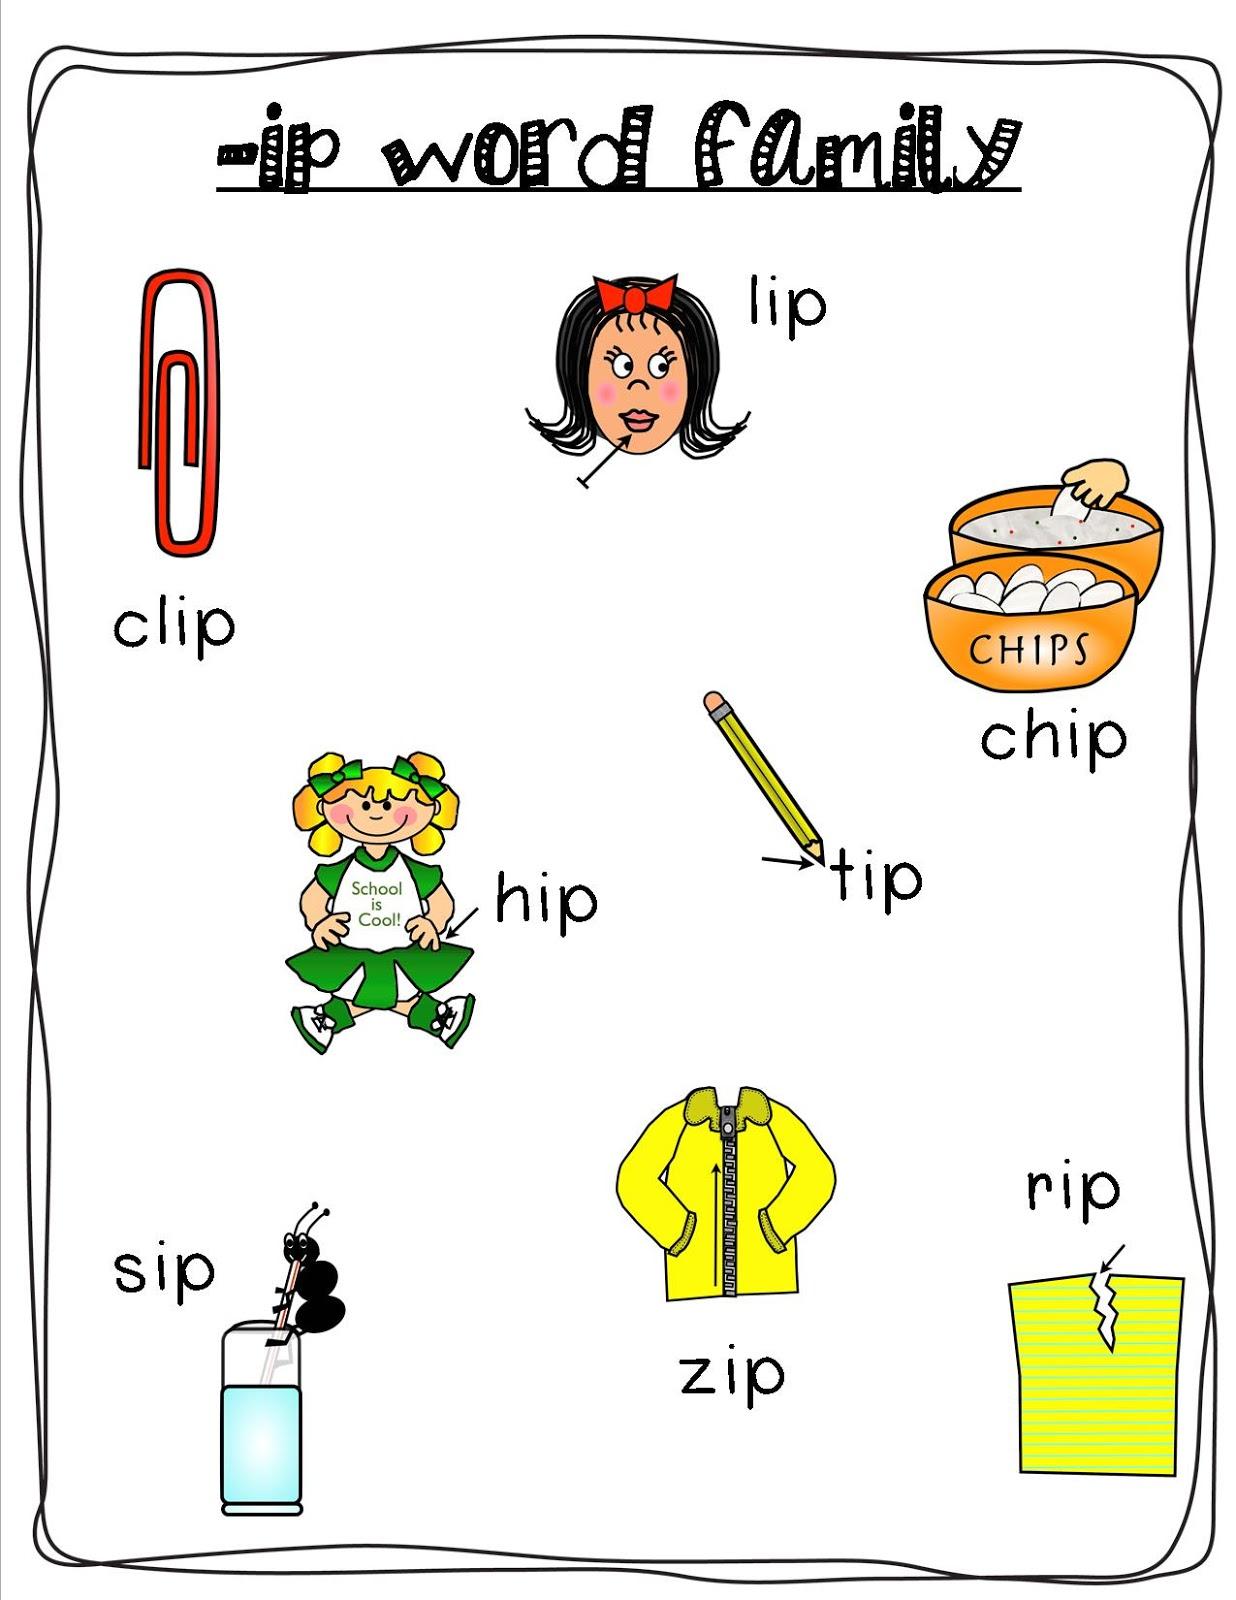 words formation, kursus bahasa inggris di bali, les private bahasa inggris di bali, lec bali